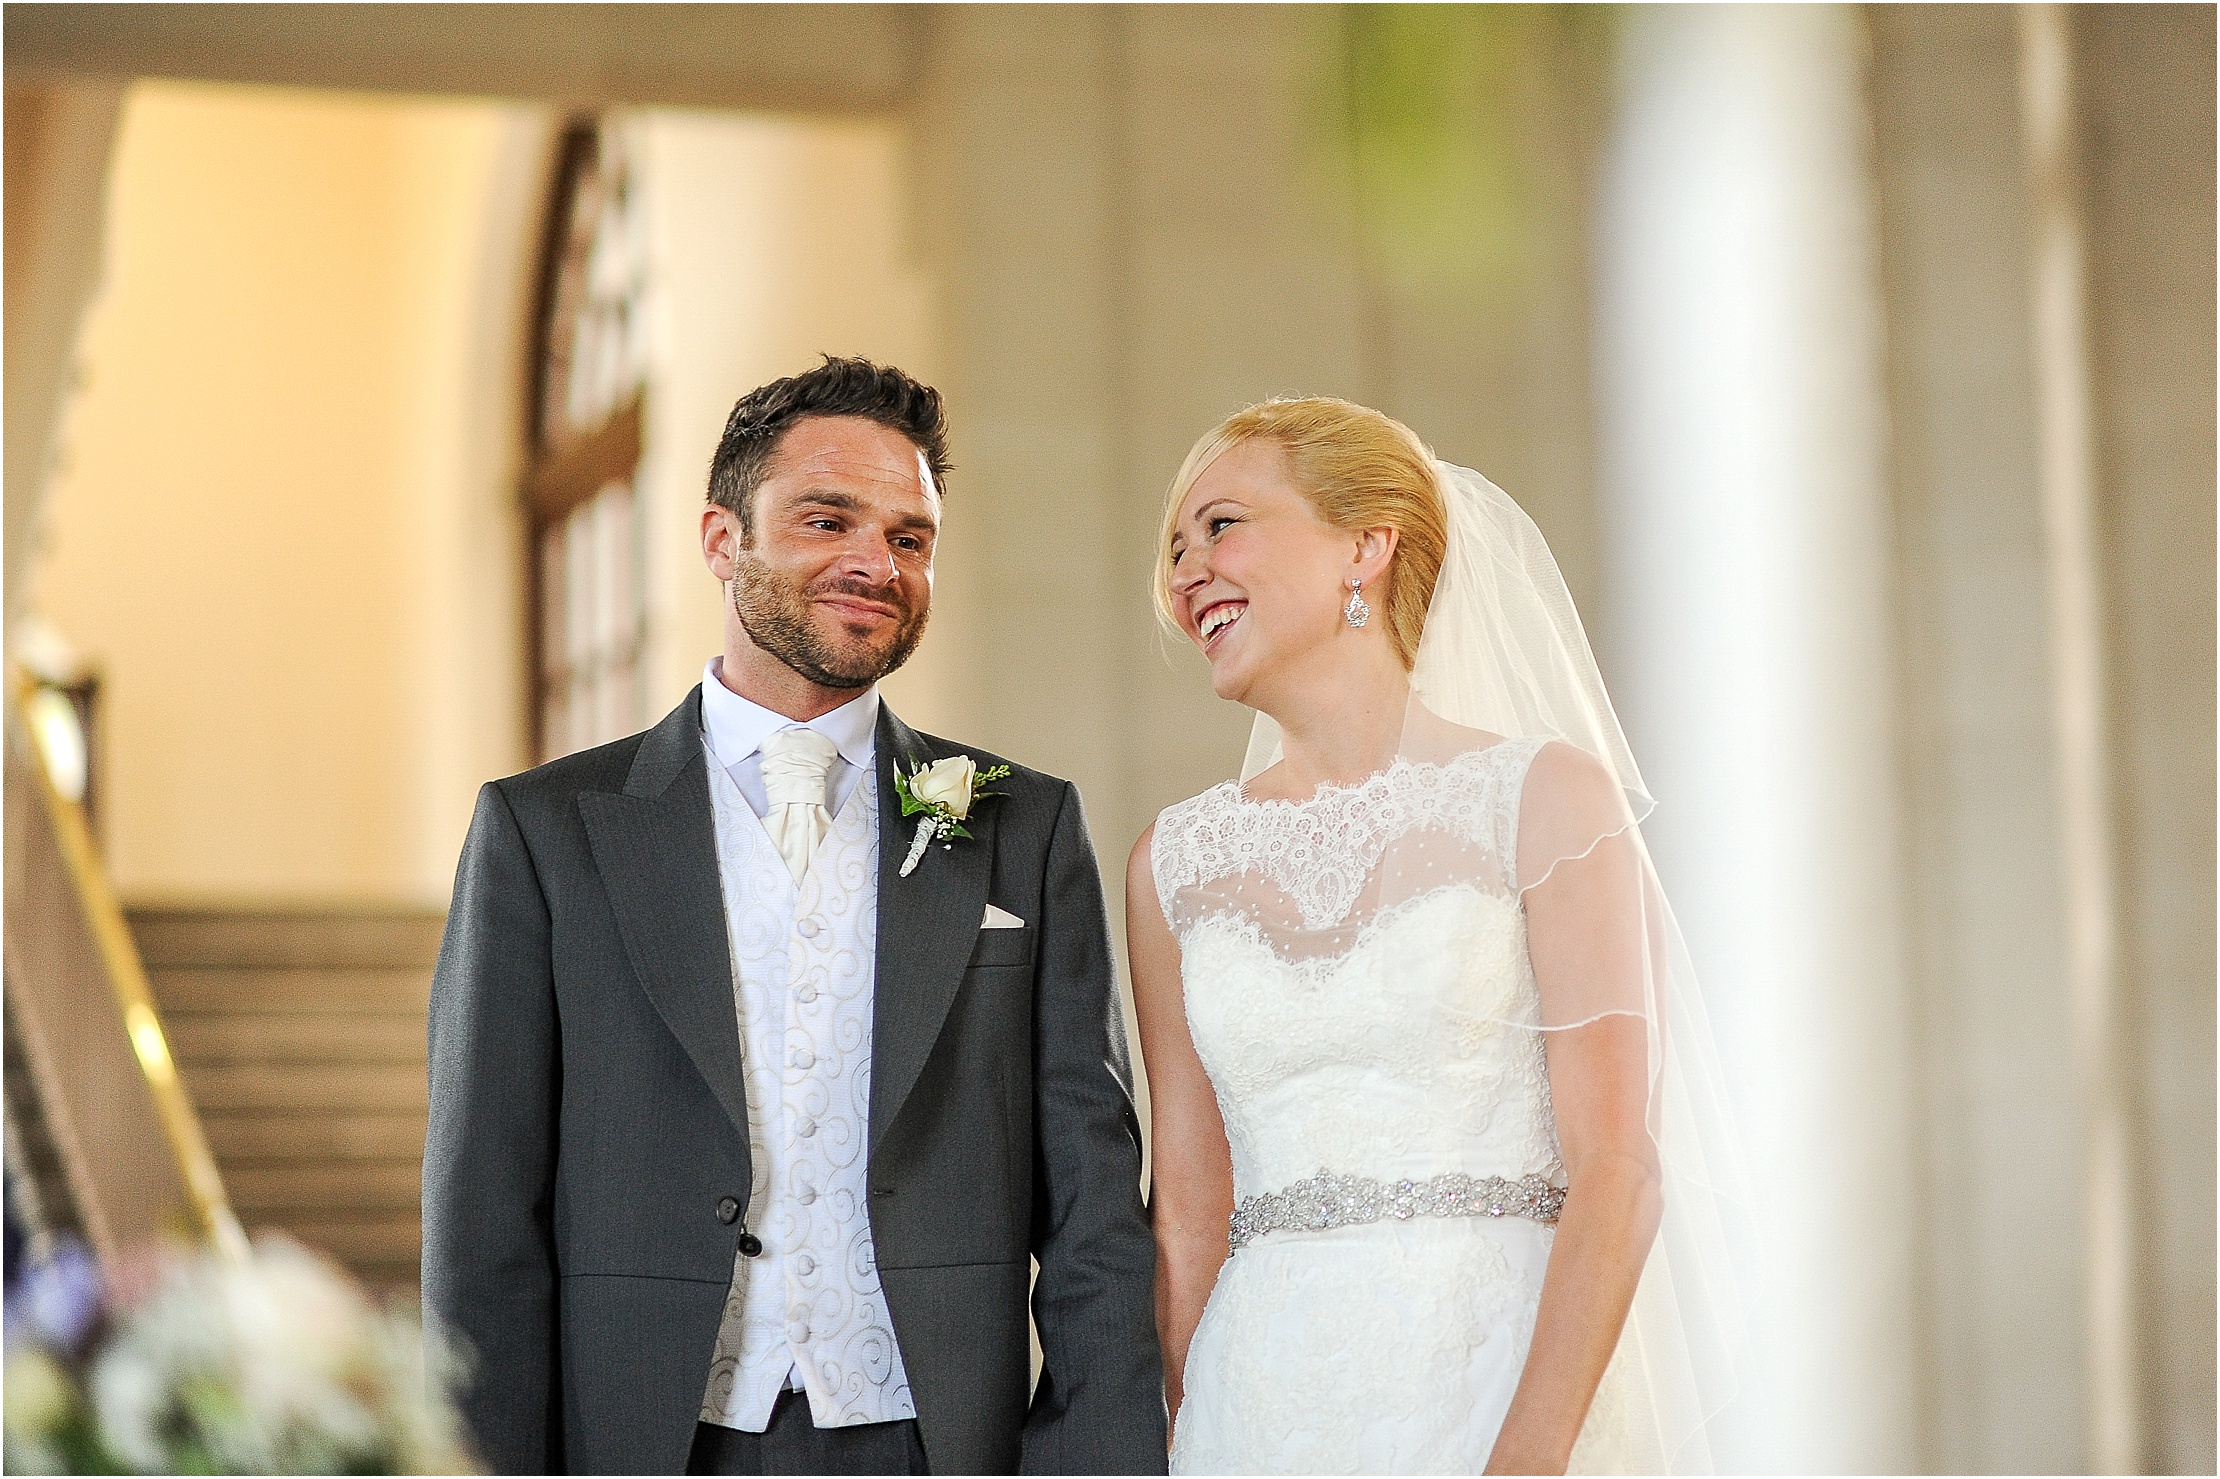 staining-lodge-wedding-065.jpg